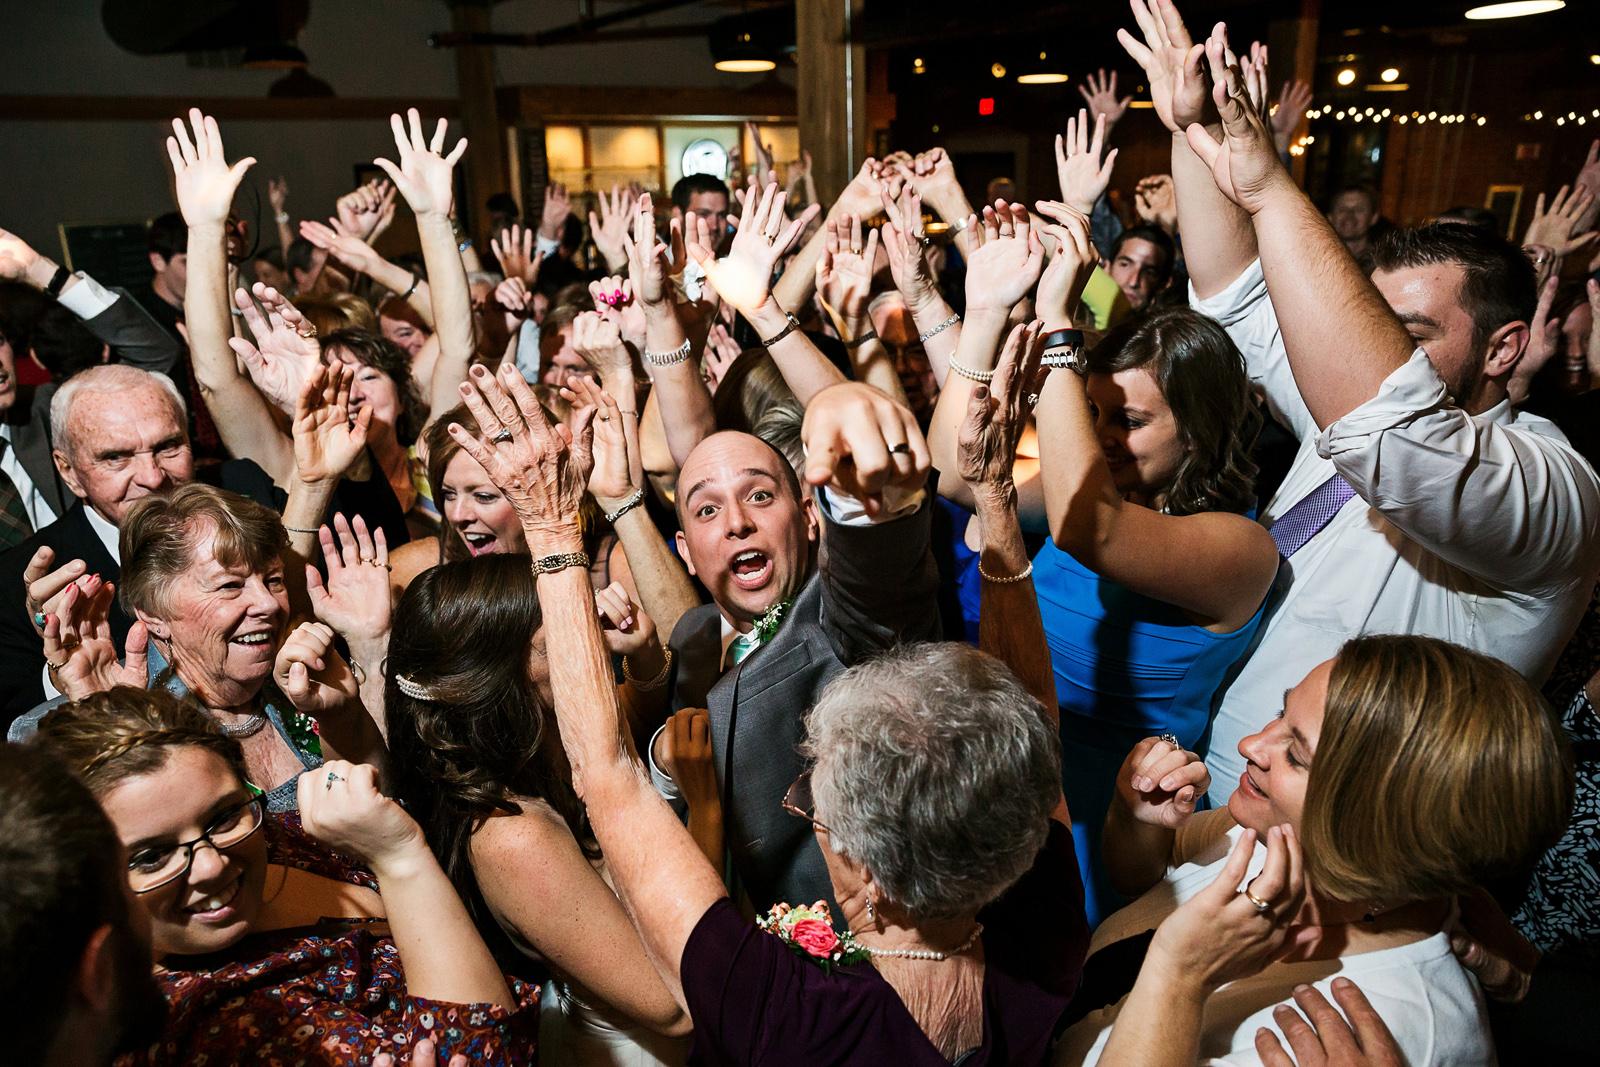 Oldani-Photography-St-Louis-Film-photographer-Schlafly-Tap-Room-Wedding-Reception_20140927_19455275.jpg